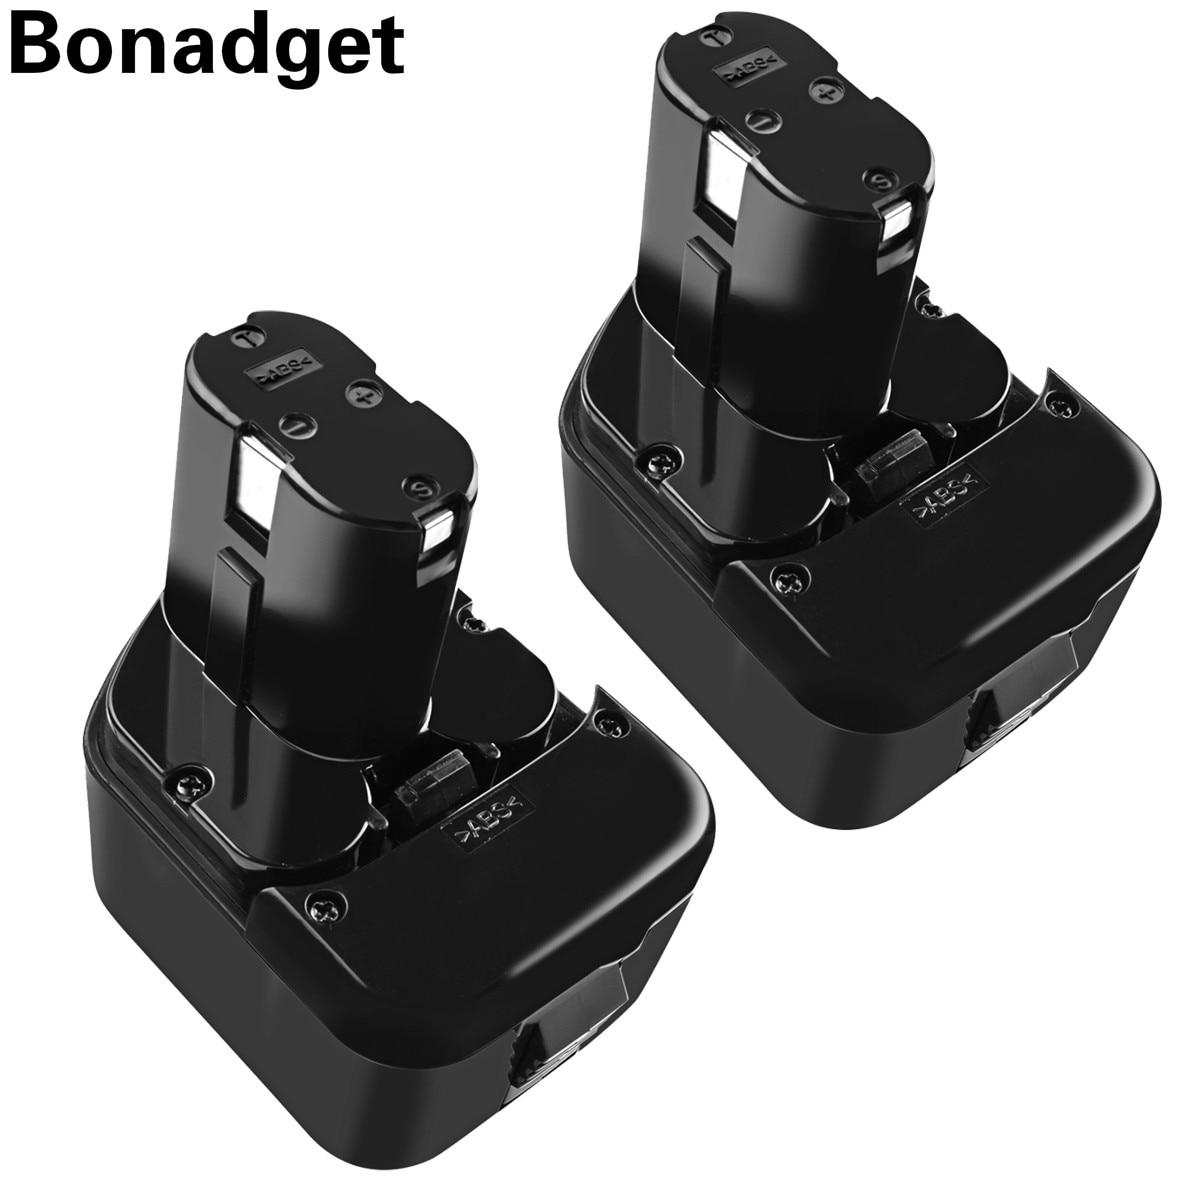 Bonadget High Quality 3500mAh 12V 3.0Ah Tool Battery For Hitachi EB1214S 12V EB1220BL EB1212S WR12DMR CD4D DH15DV C5D DS 12DVF3